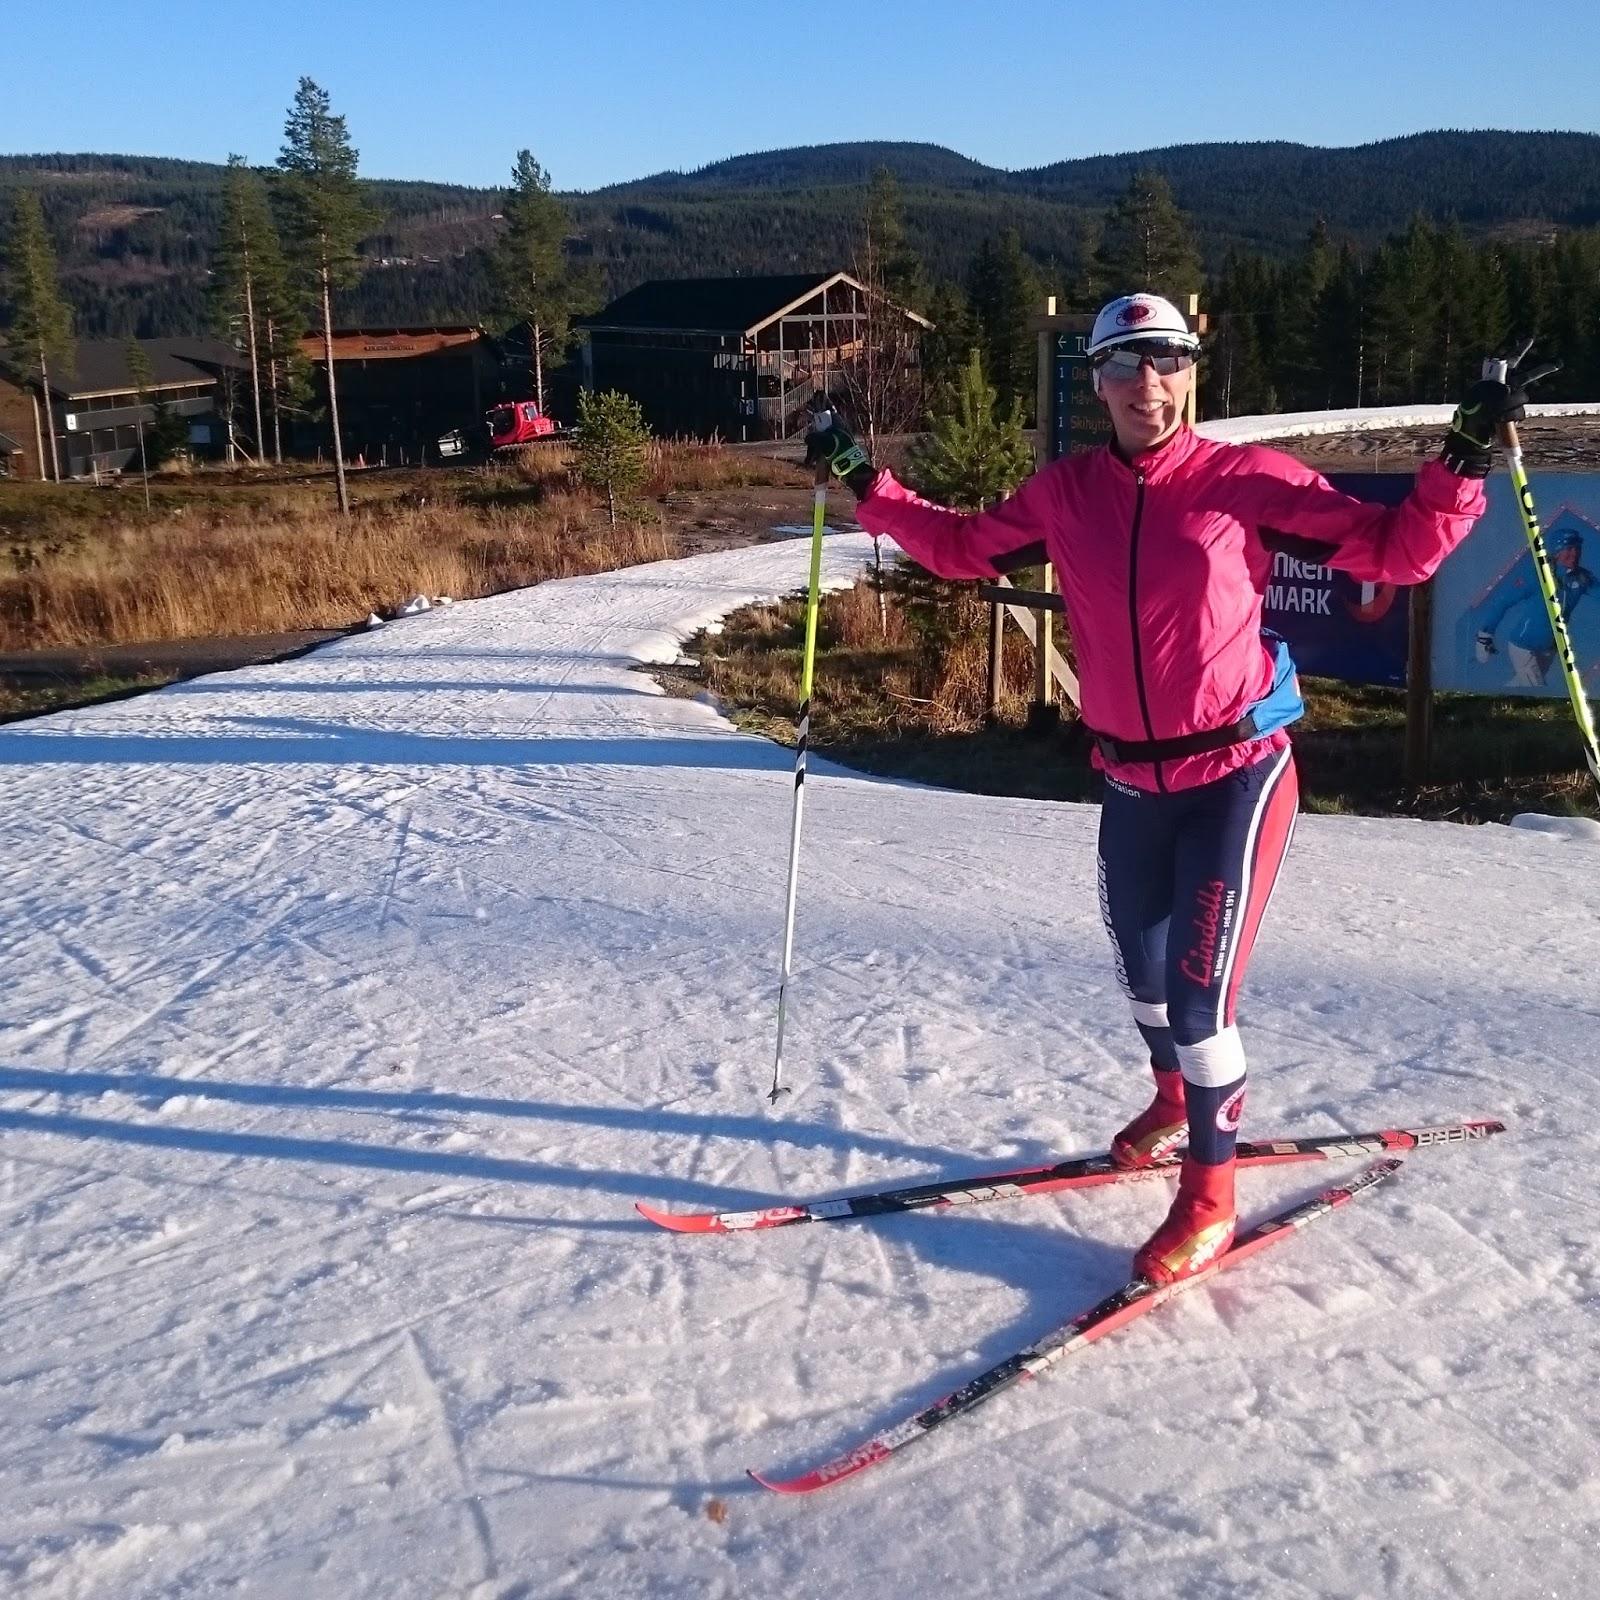 Annu ett svenskt skidfiasko